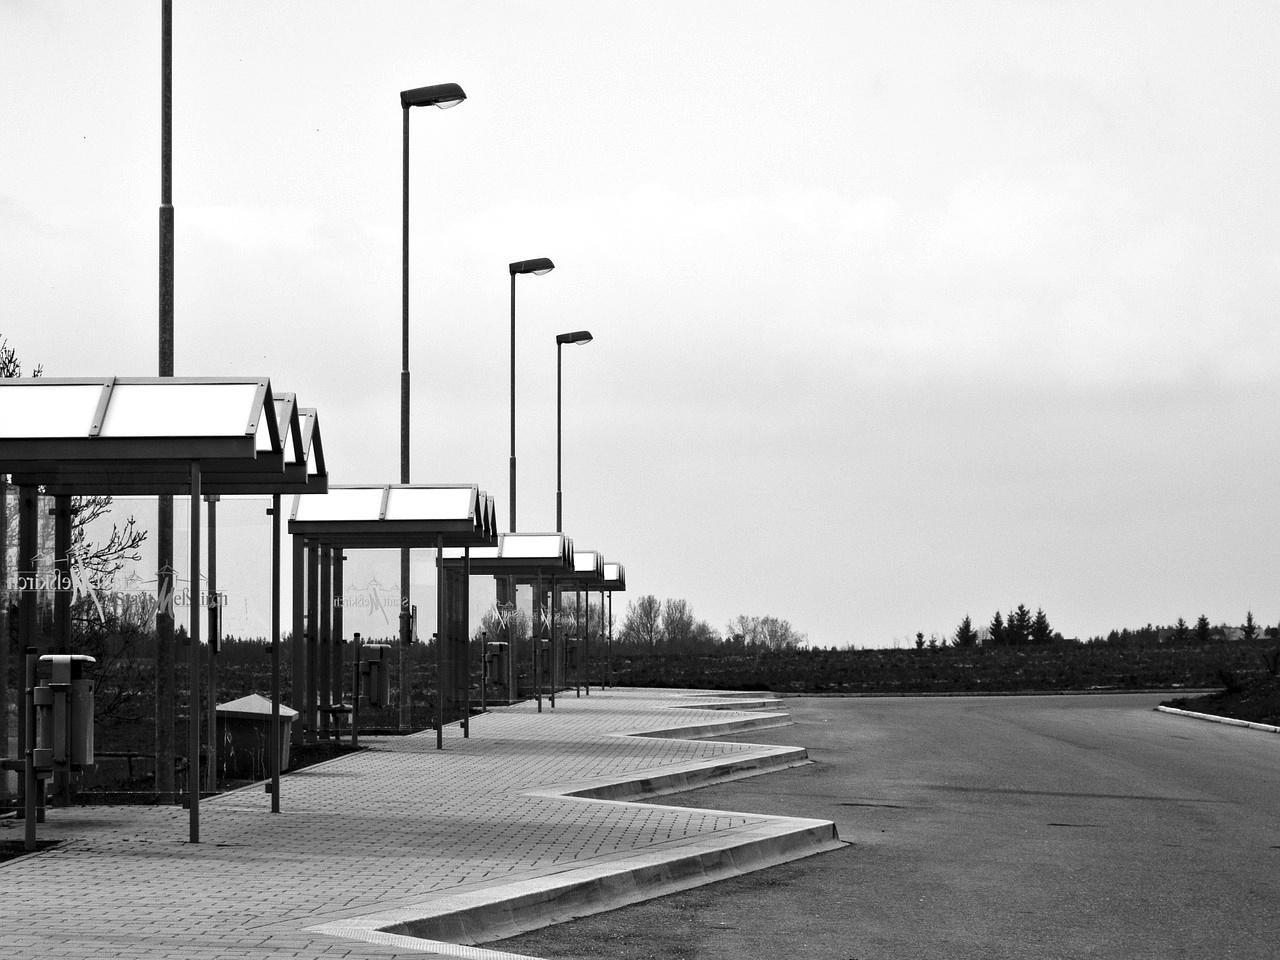 Gare routière vide